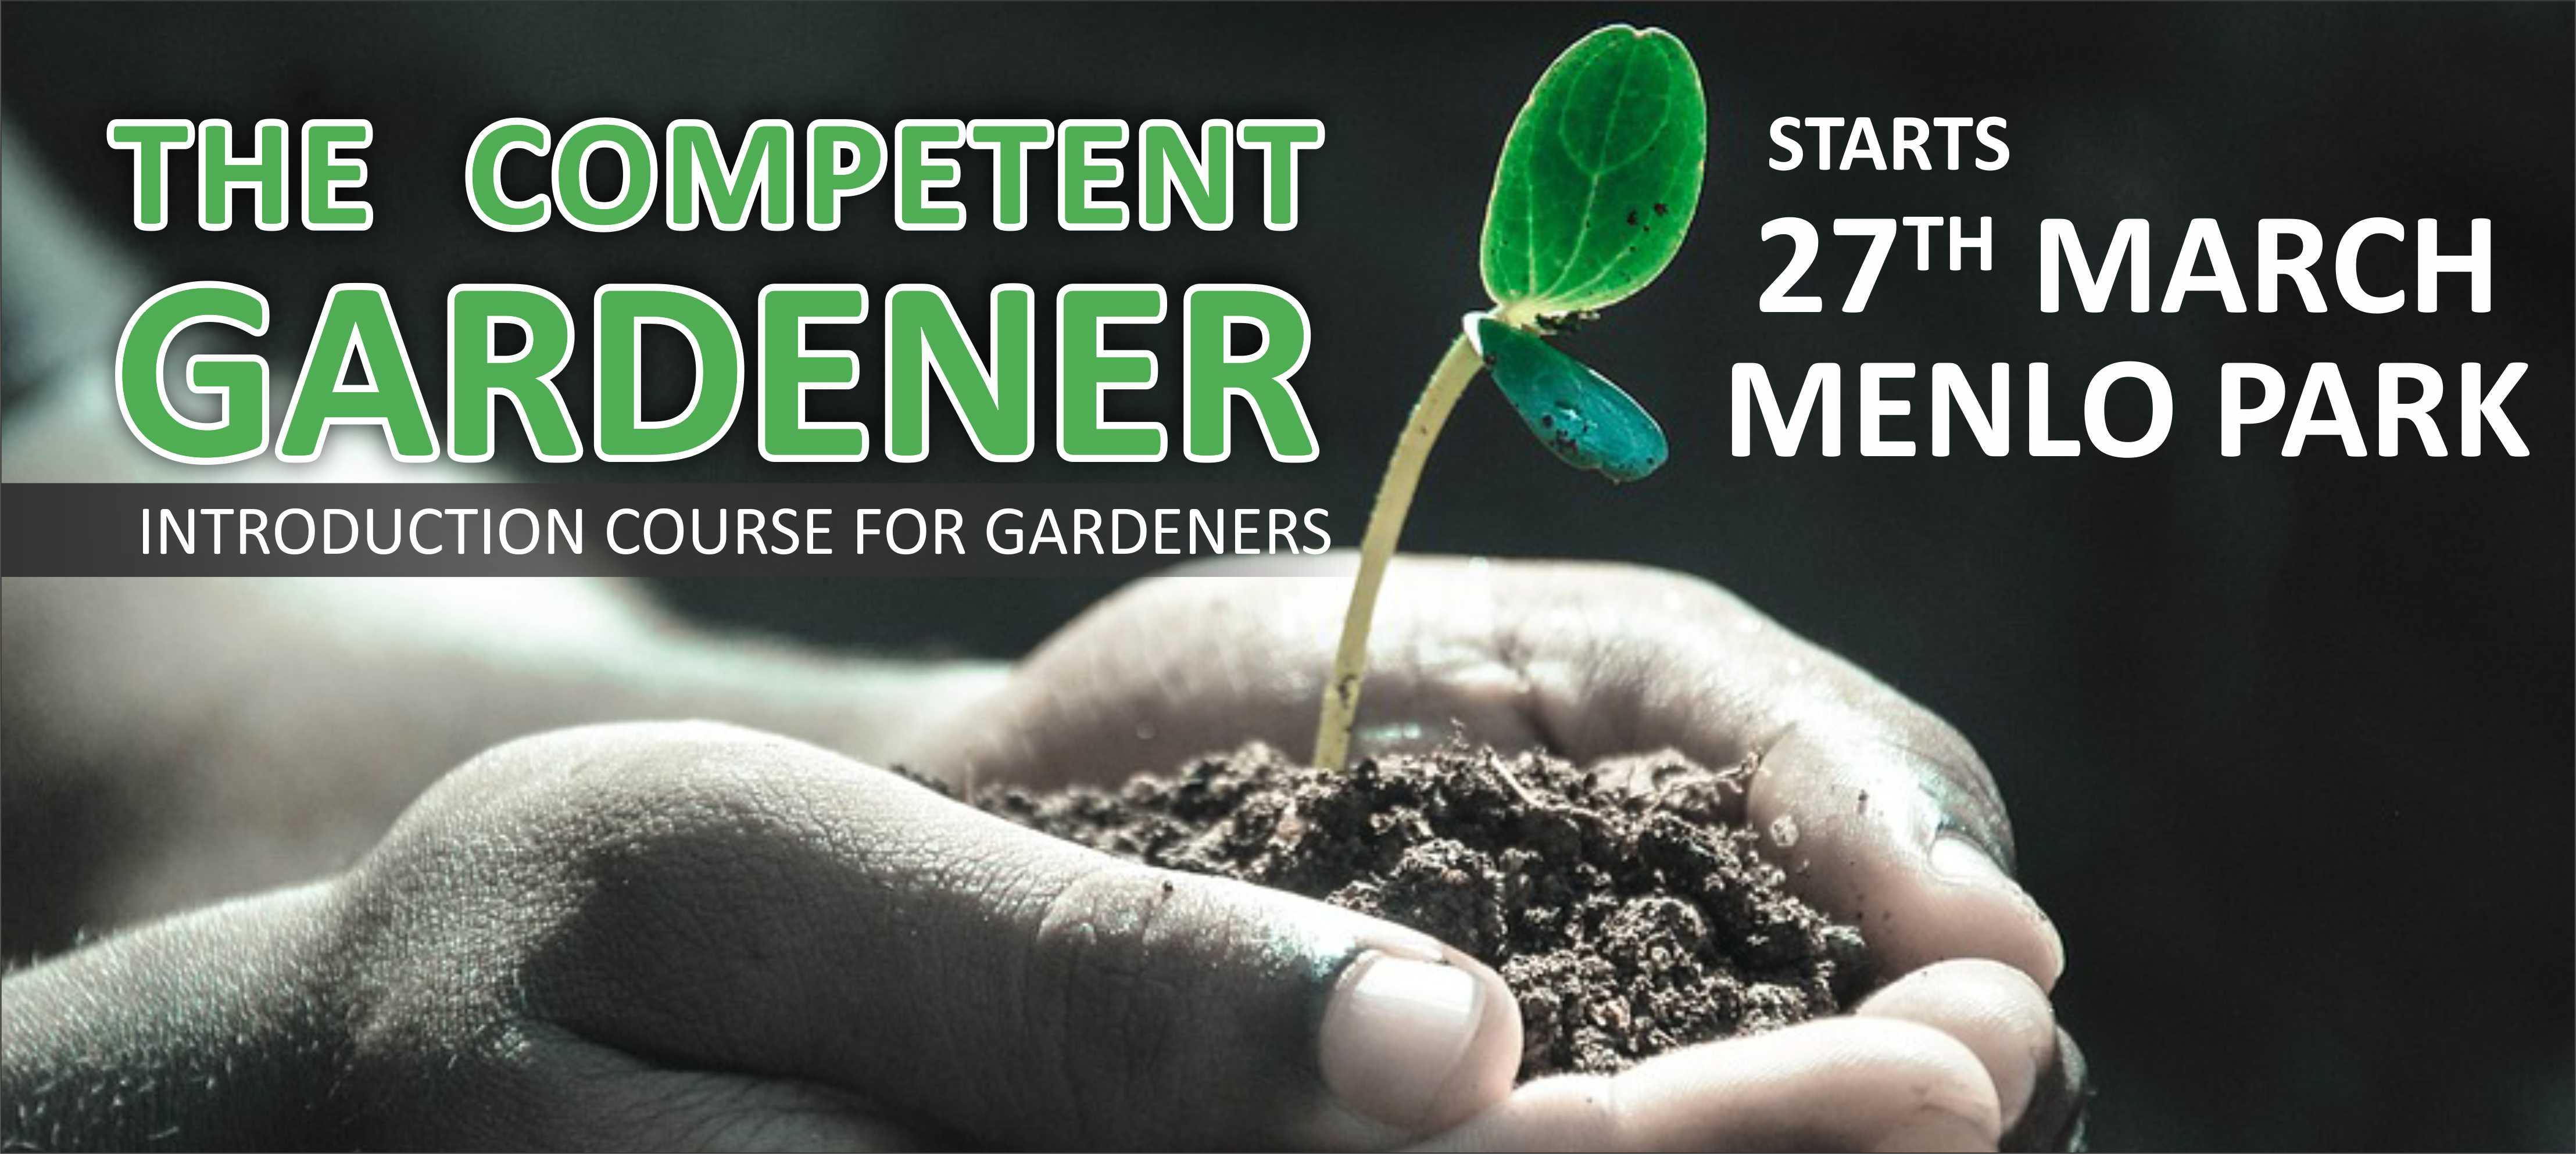 Gardeners course